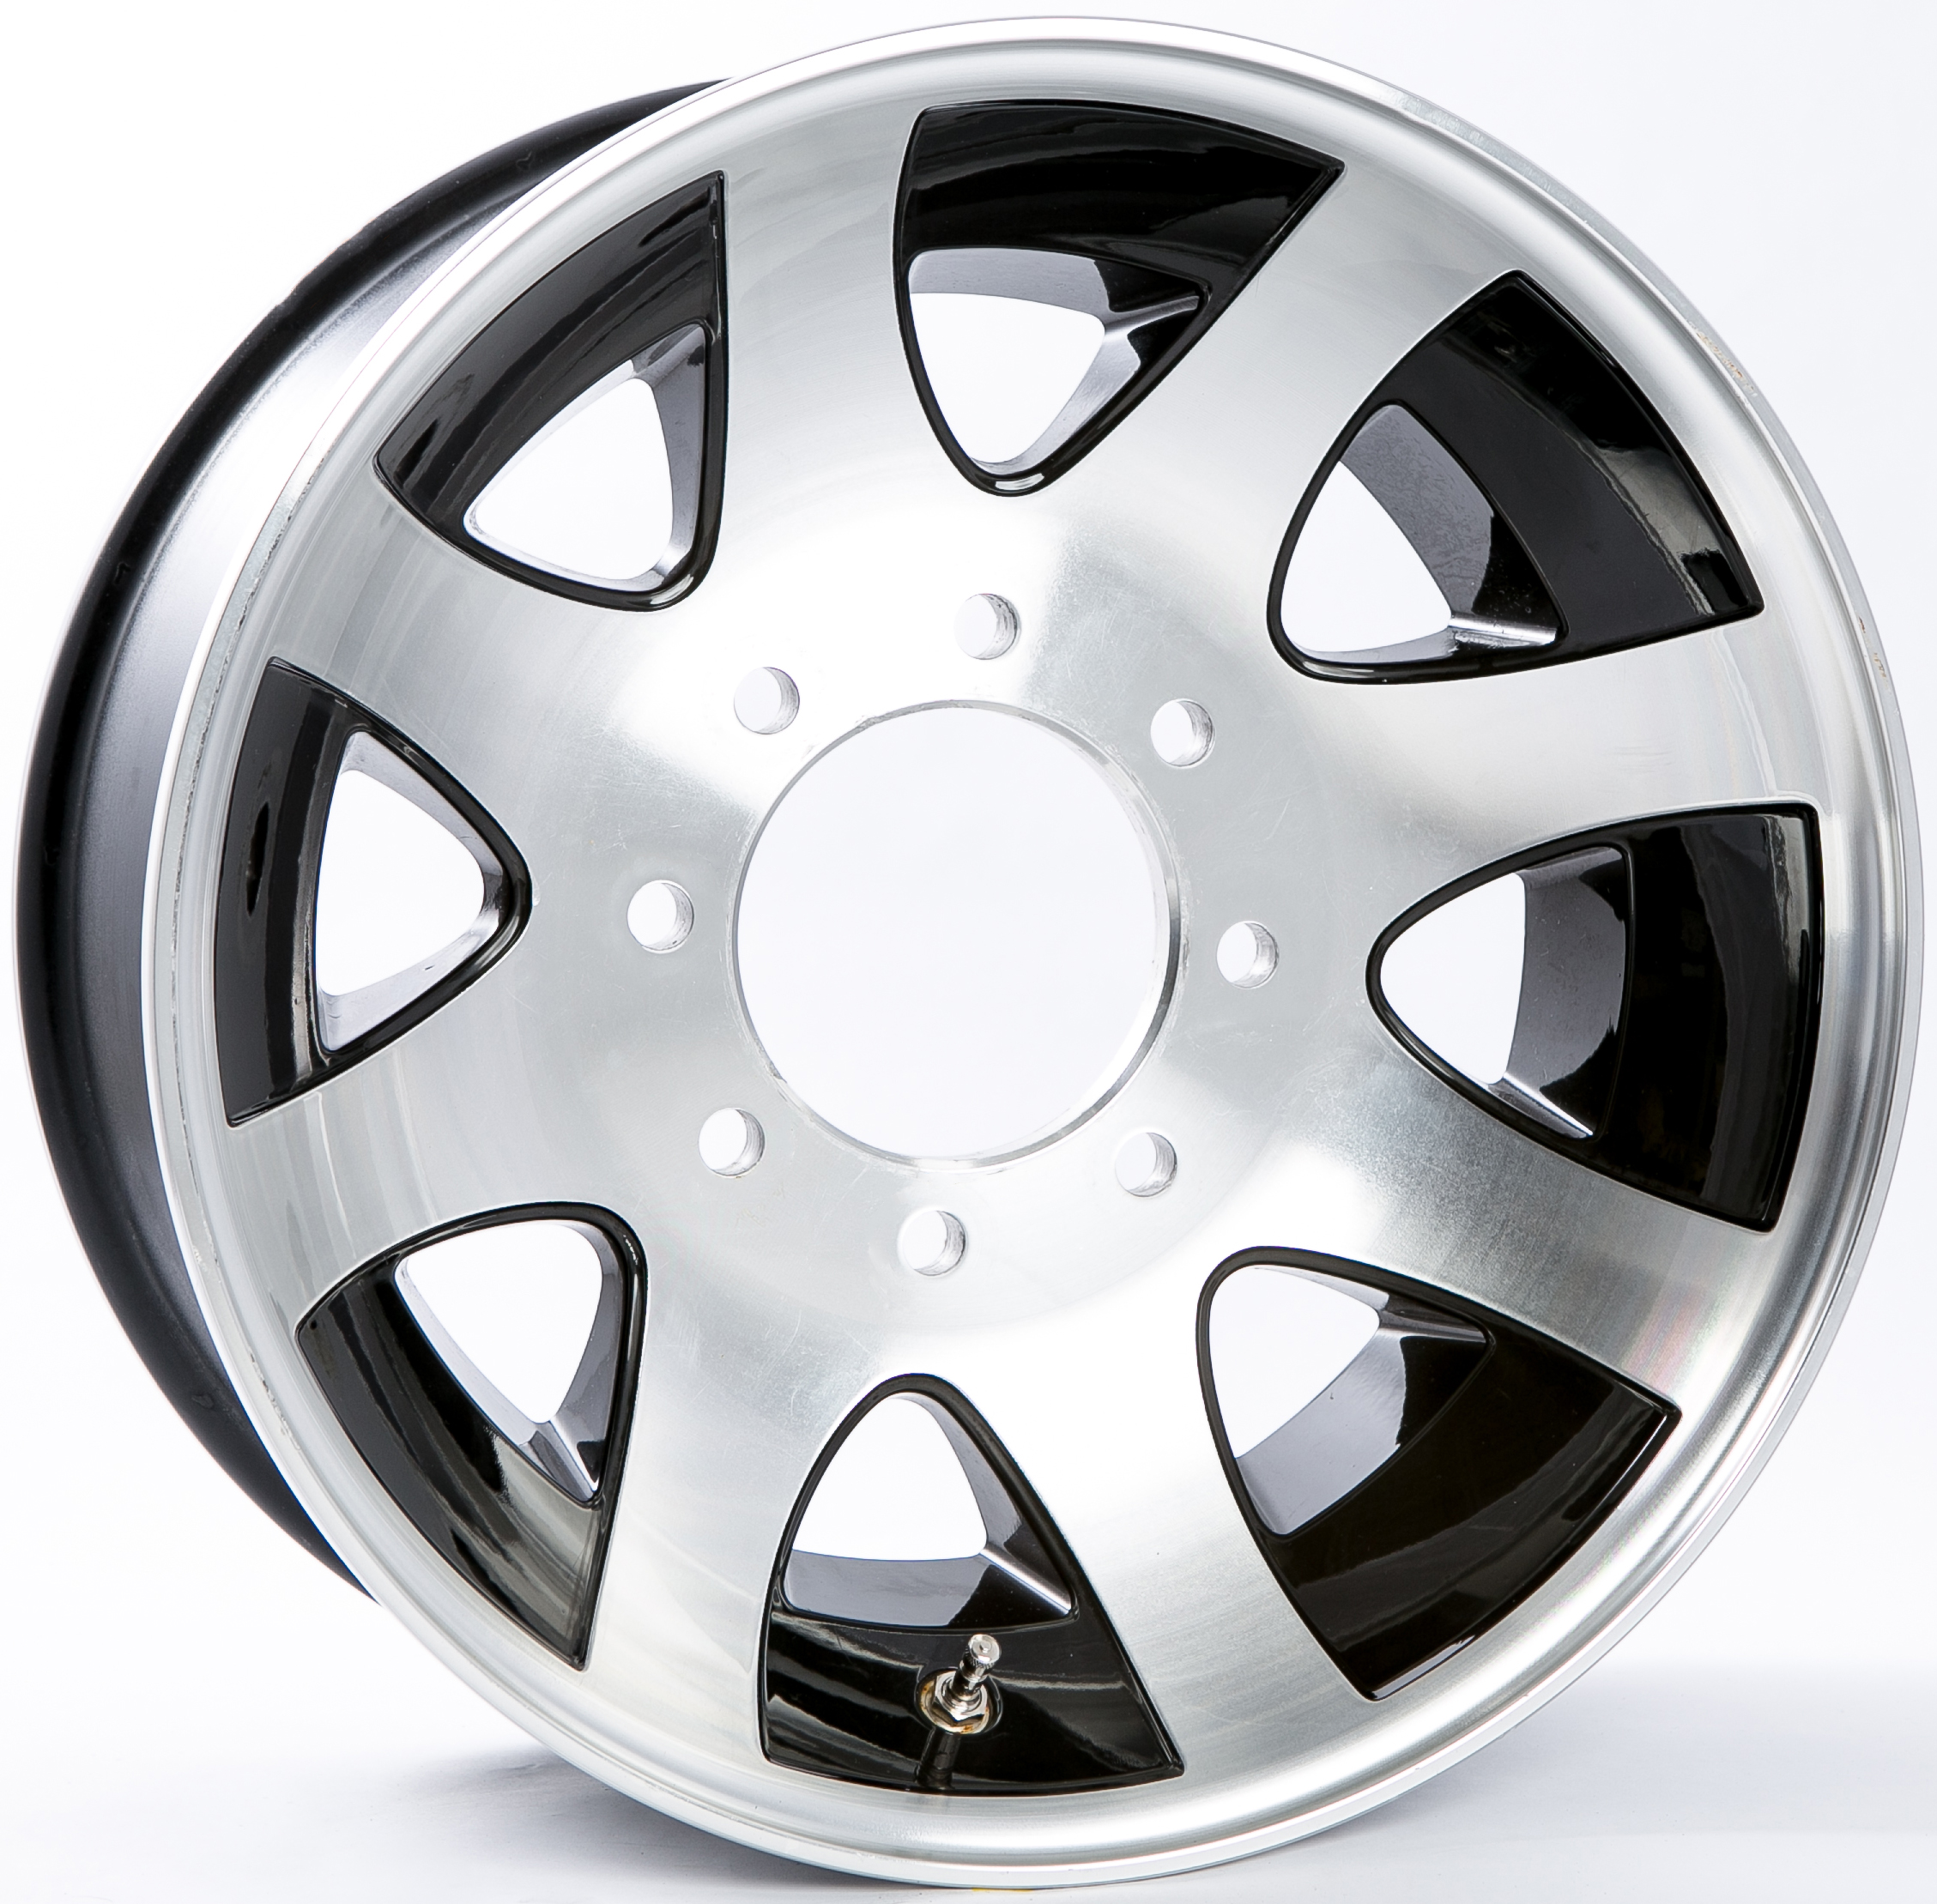 17.5x6.75 8-6.5 Black/Machine Aluminum Spoke Wheel Image